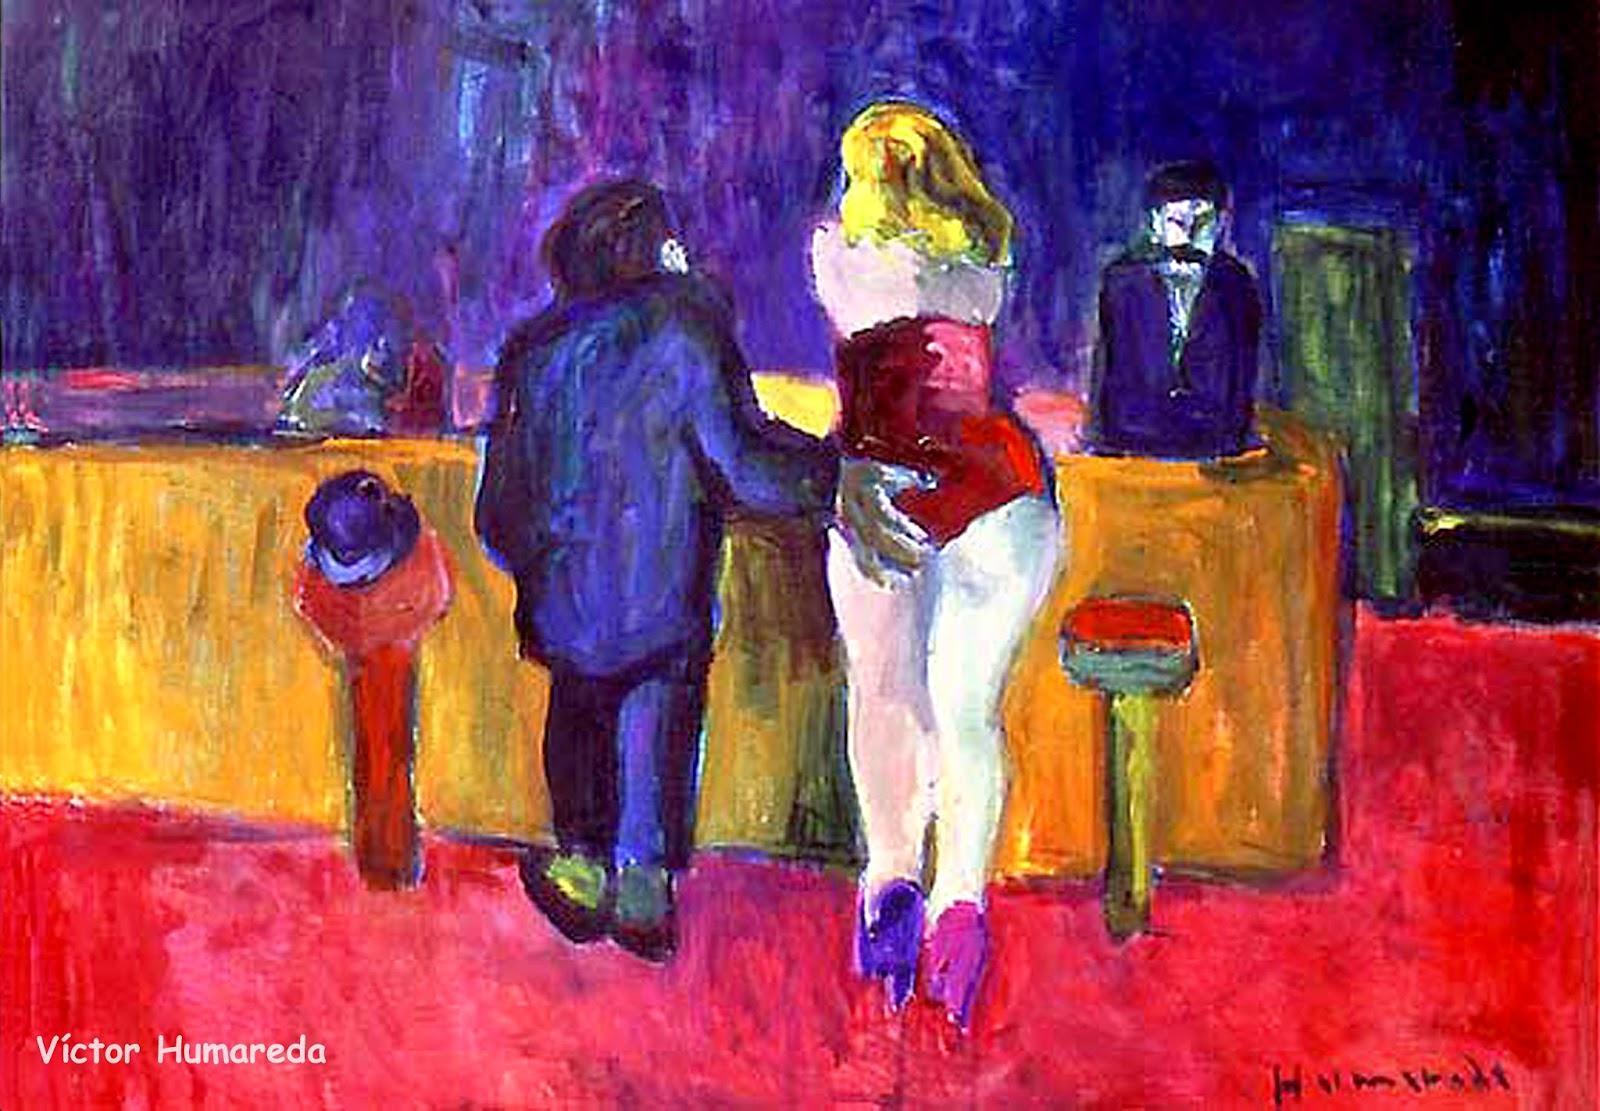 prostitutas en la pintura alfonso basterra prostitutas